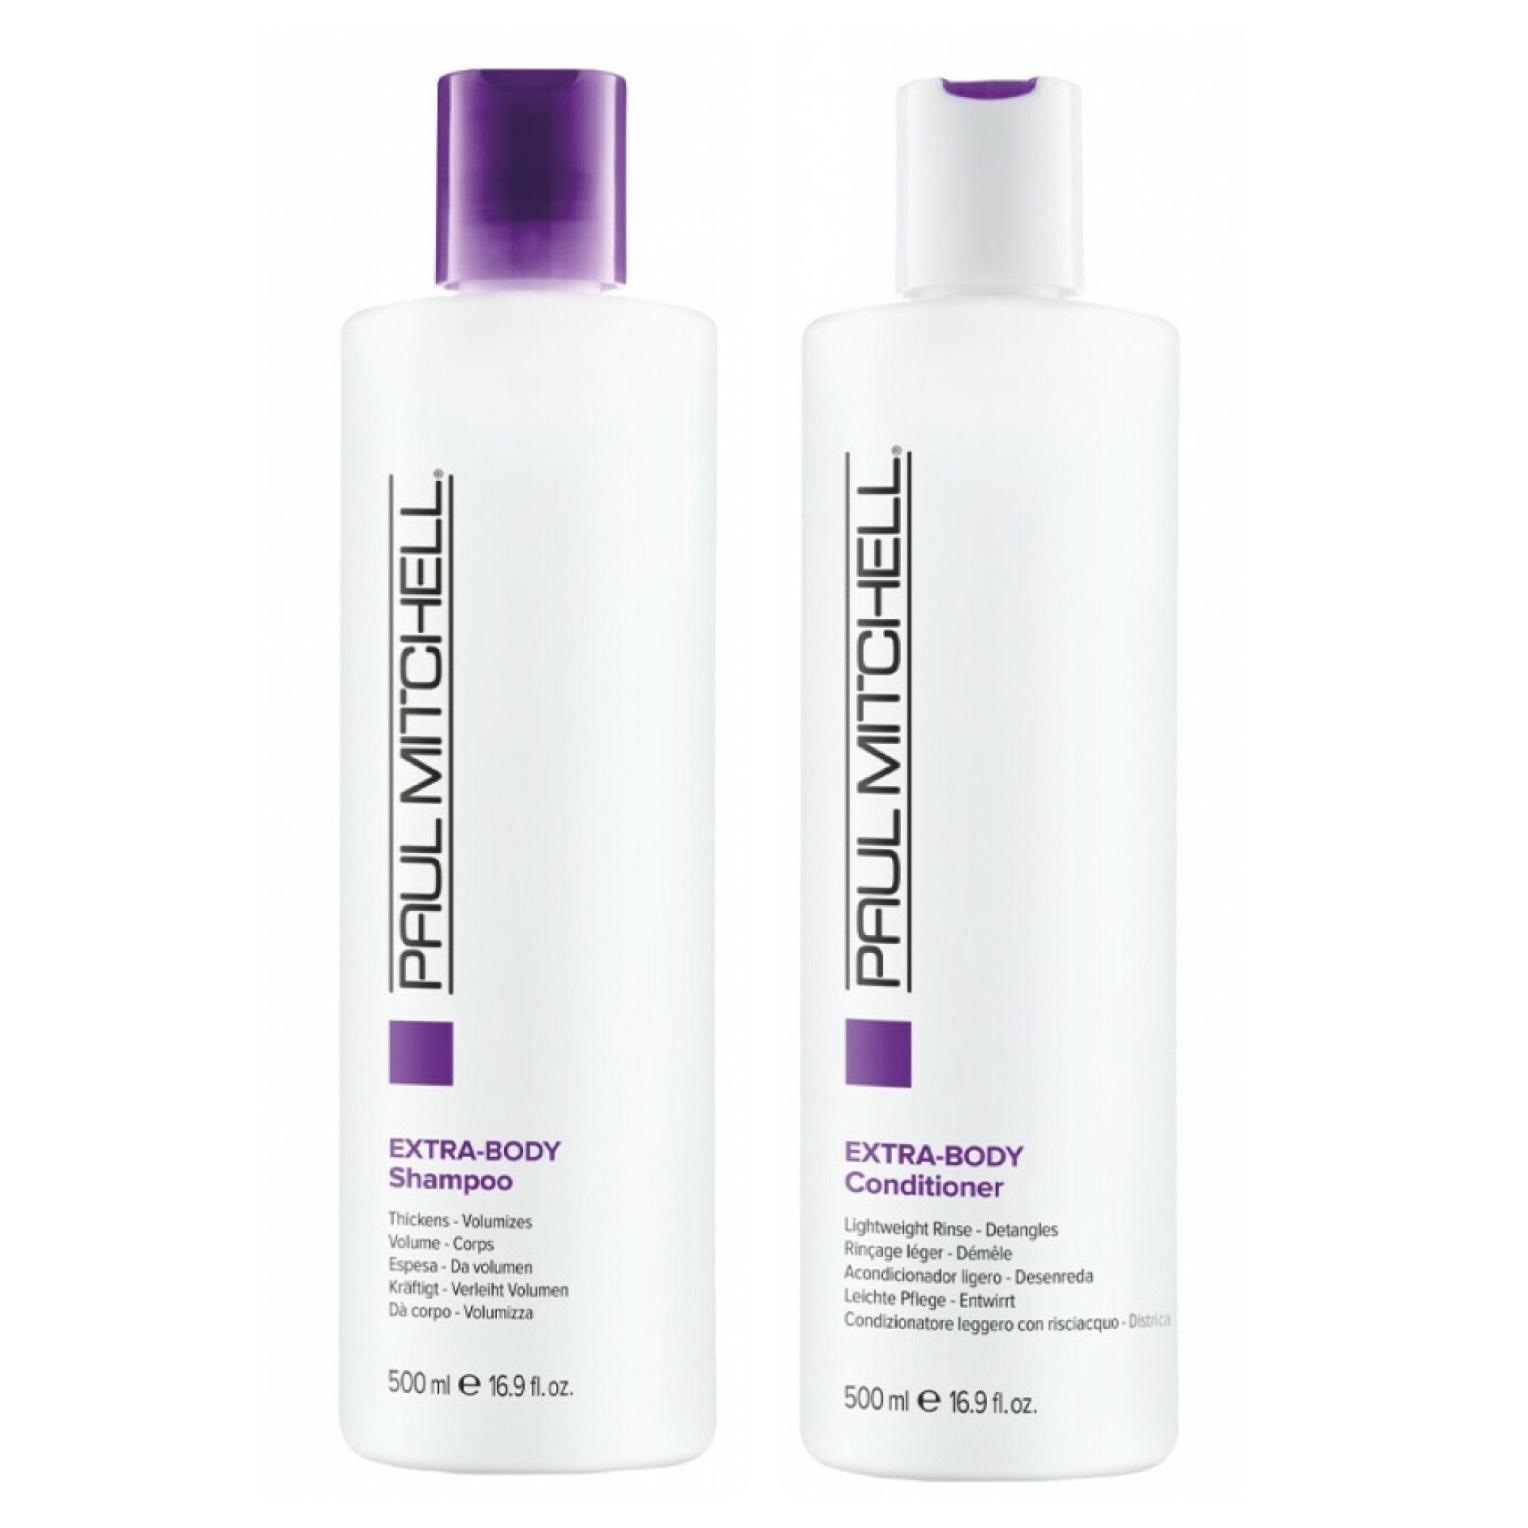 Paul Mitchell Extra-Body 500ml Set - Extra-Body Shampoo 500ml + Extra-Body Conditioner 500ml